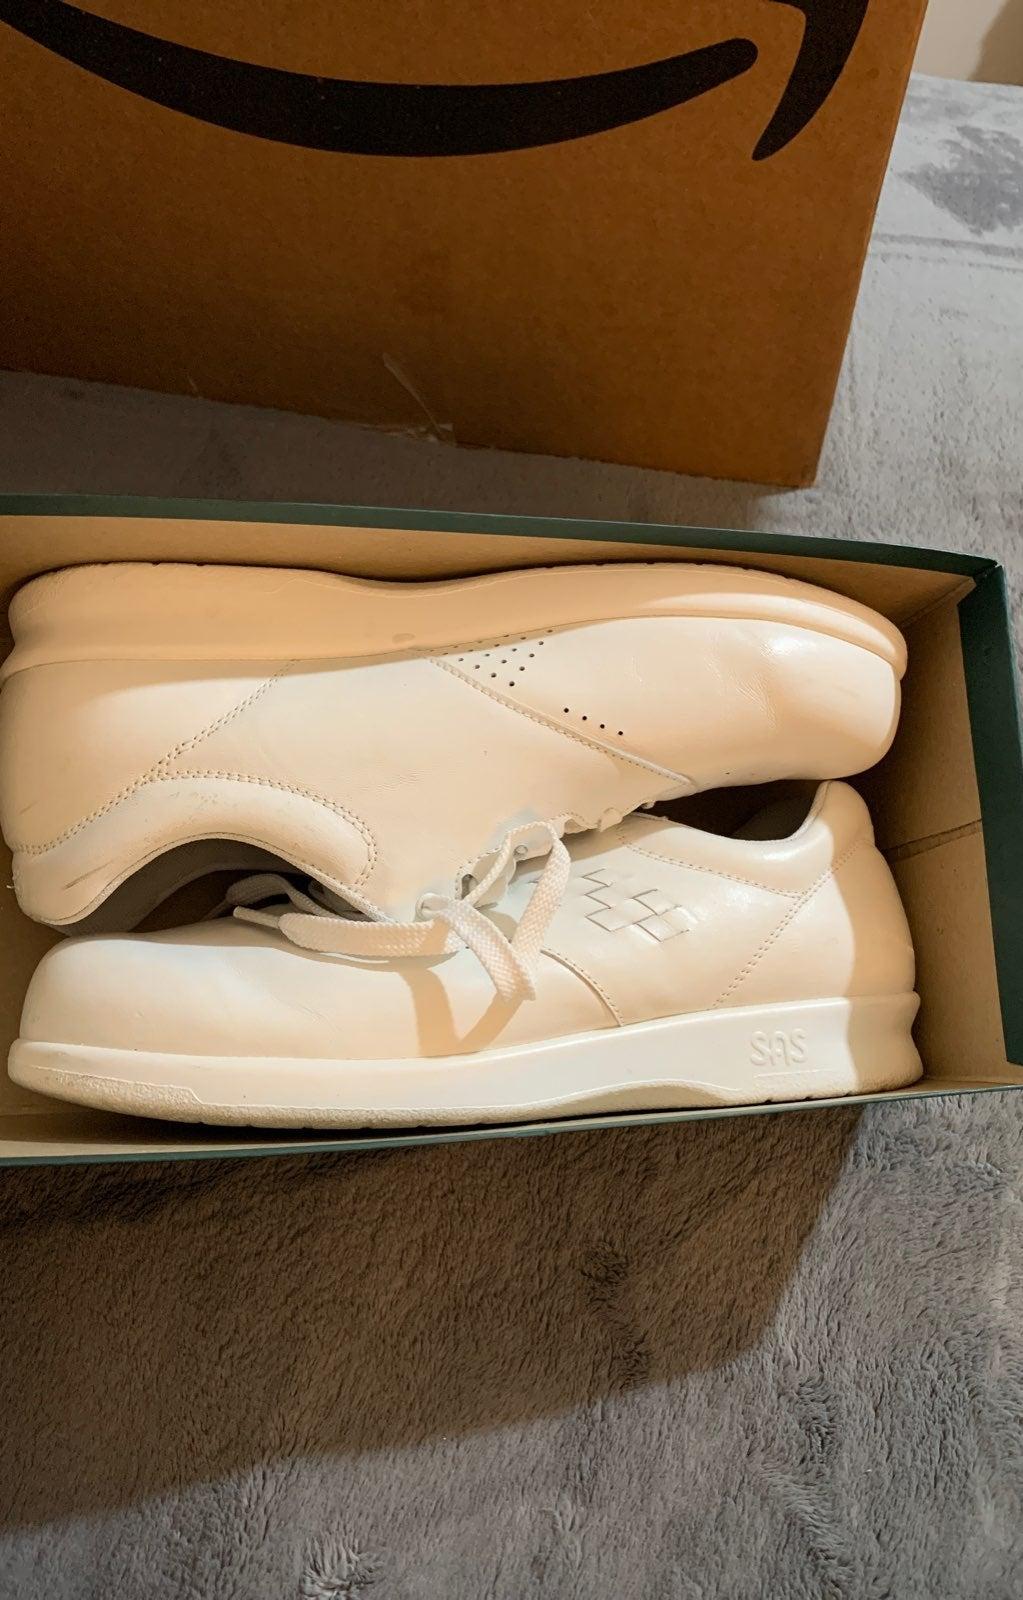 Womens SAS shoes 9